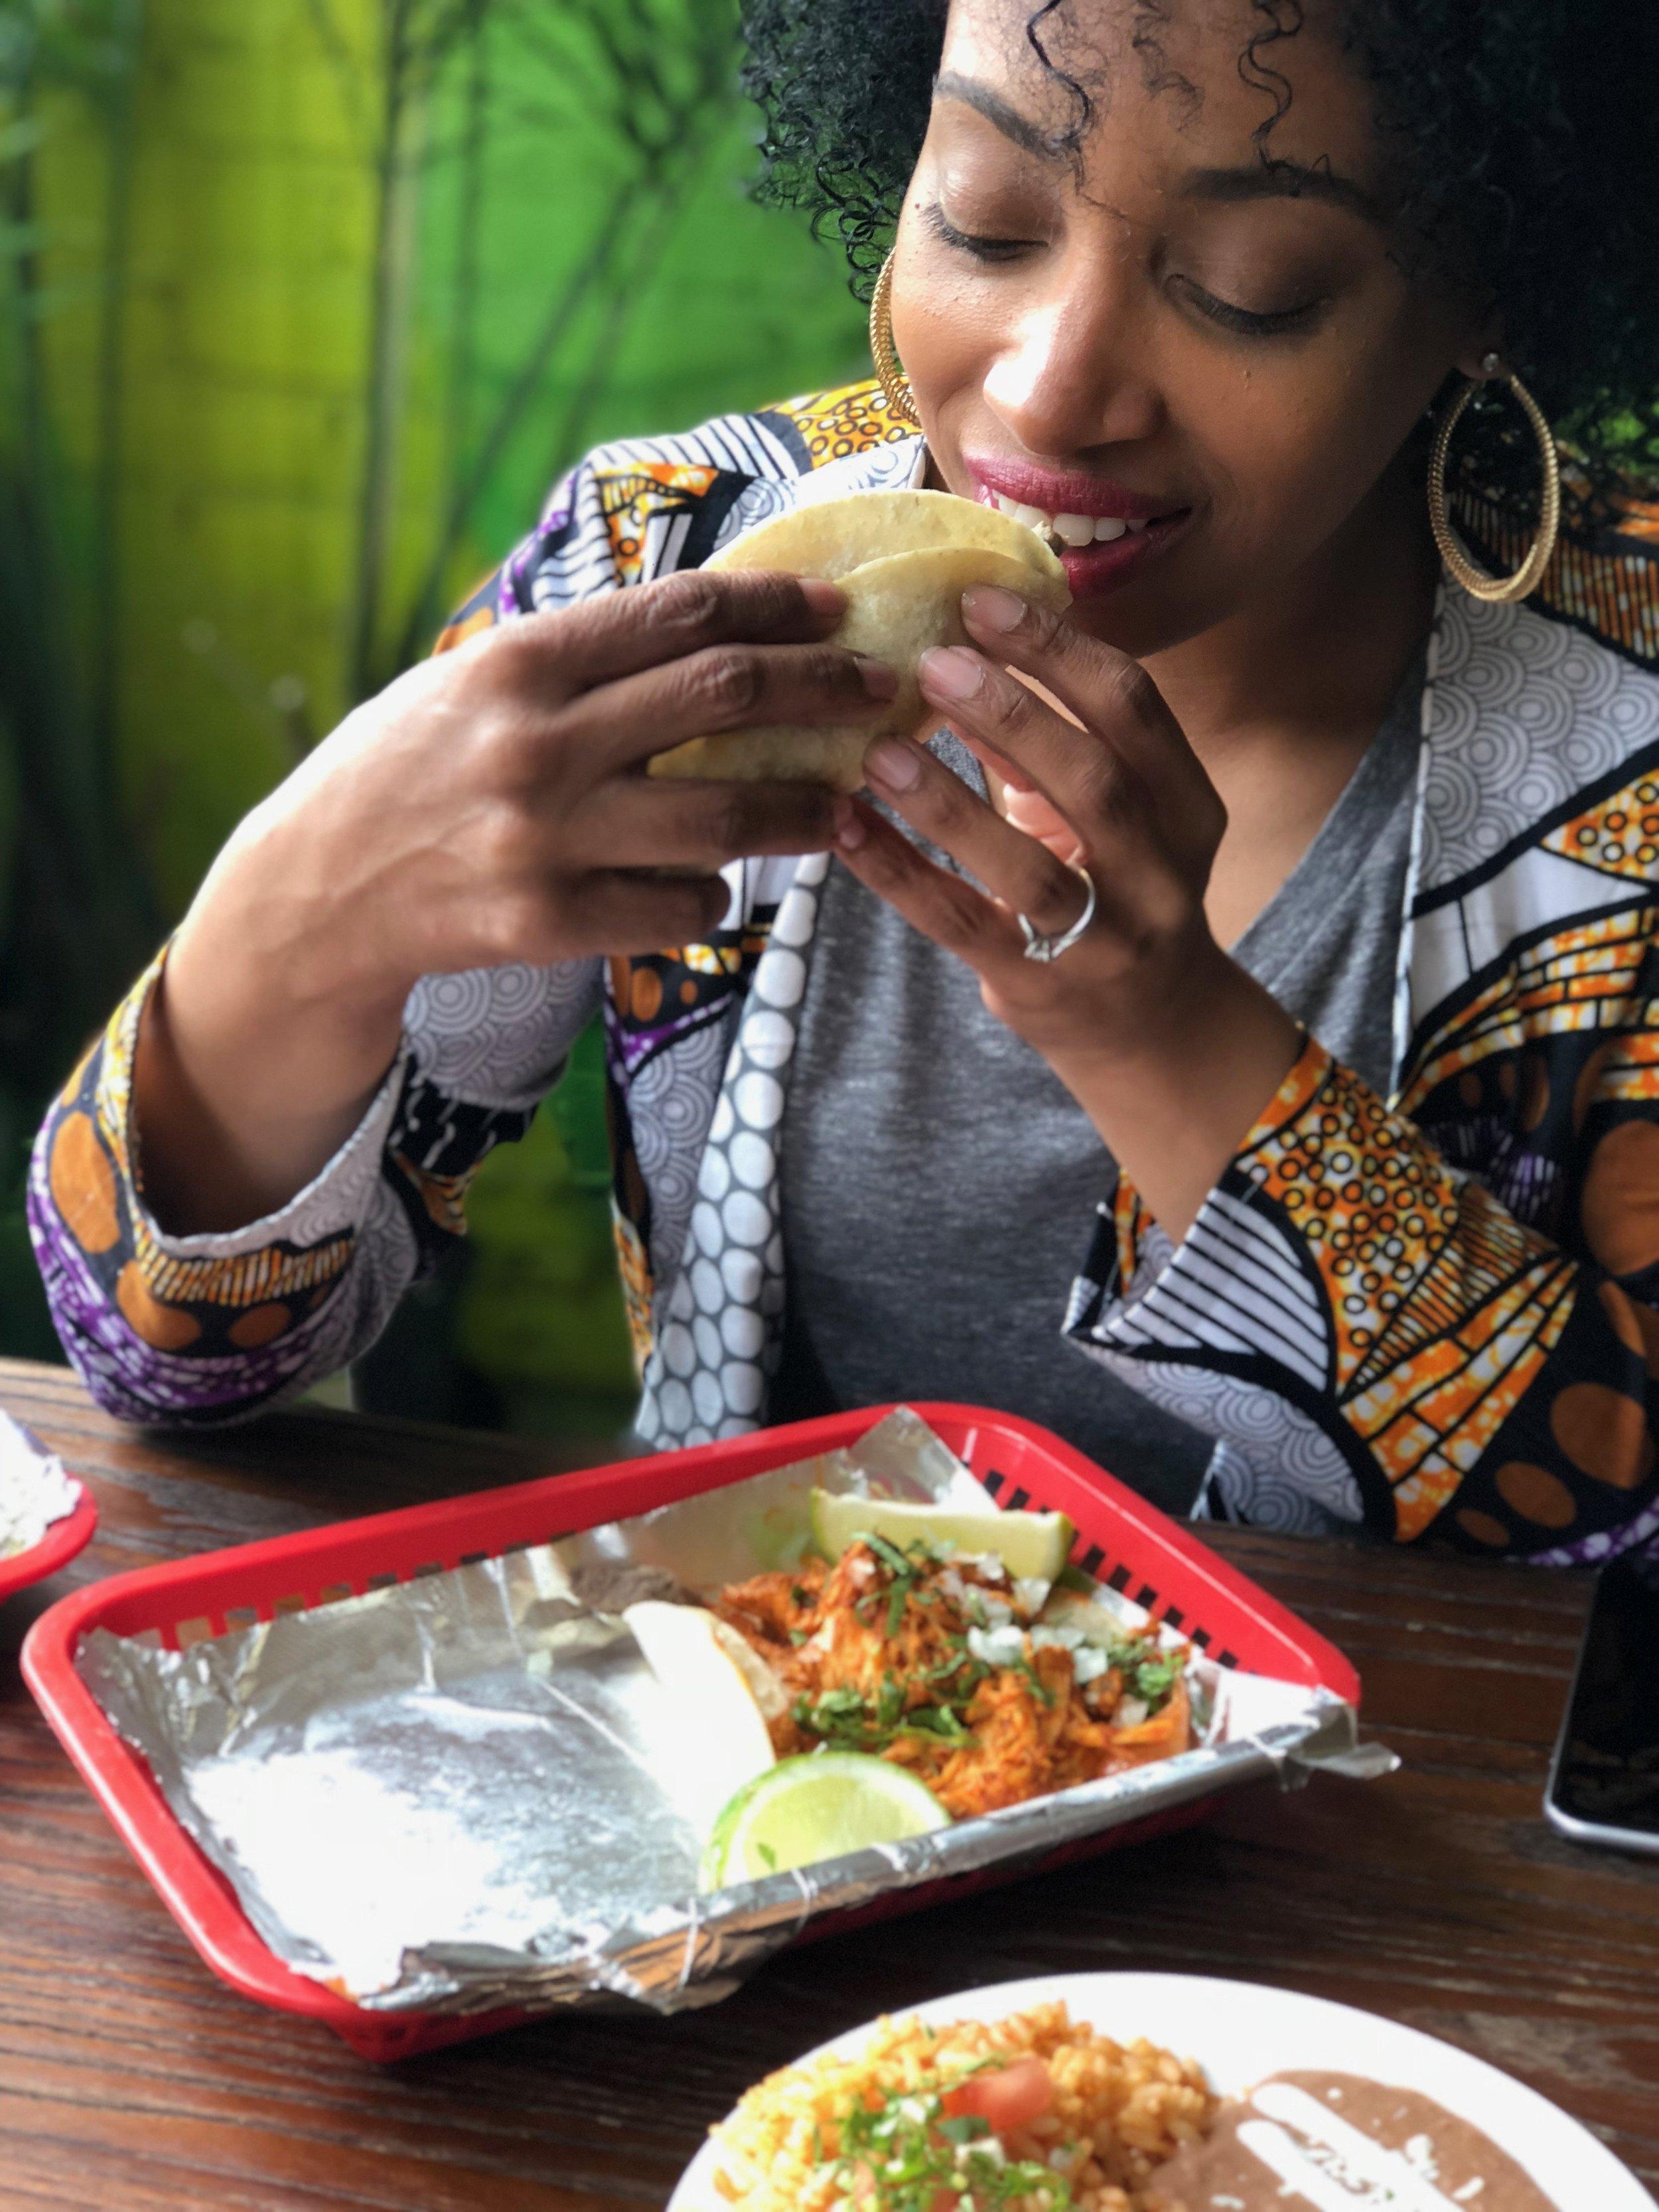 Andrea Fenise Memphis Fashion Blogger and Memphis Food Blogger reviews Maciel's Taco Shop